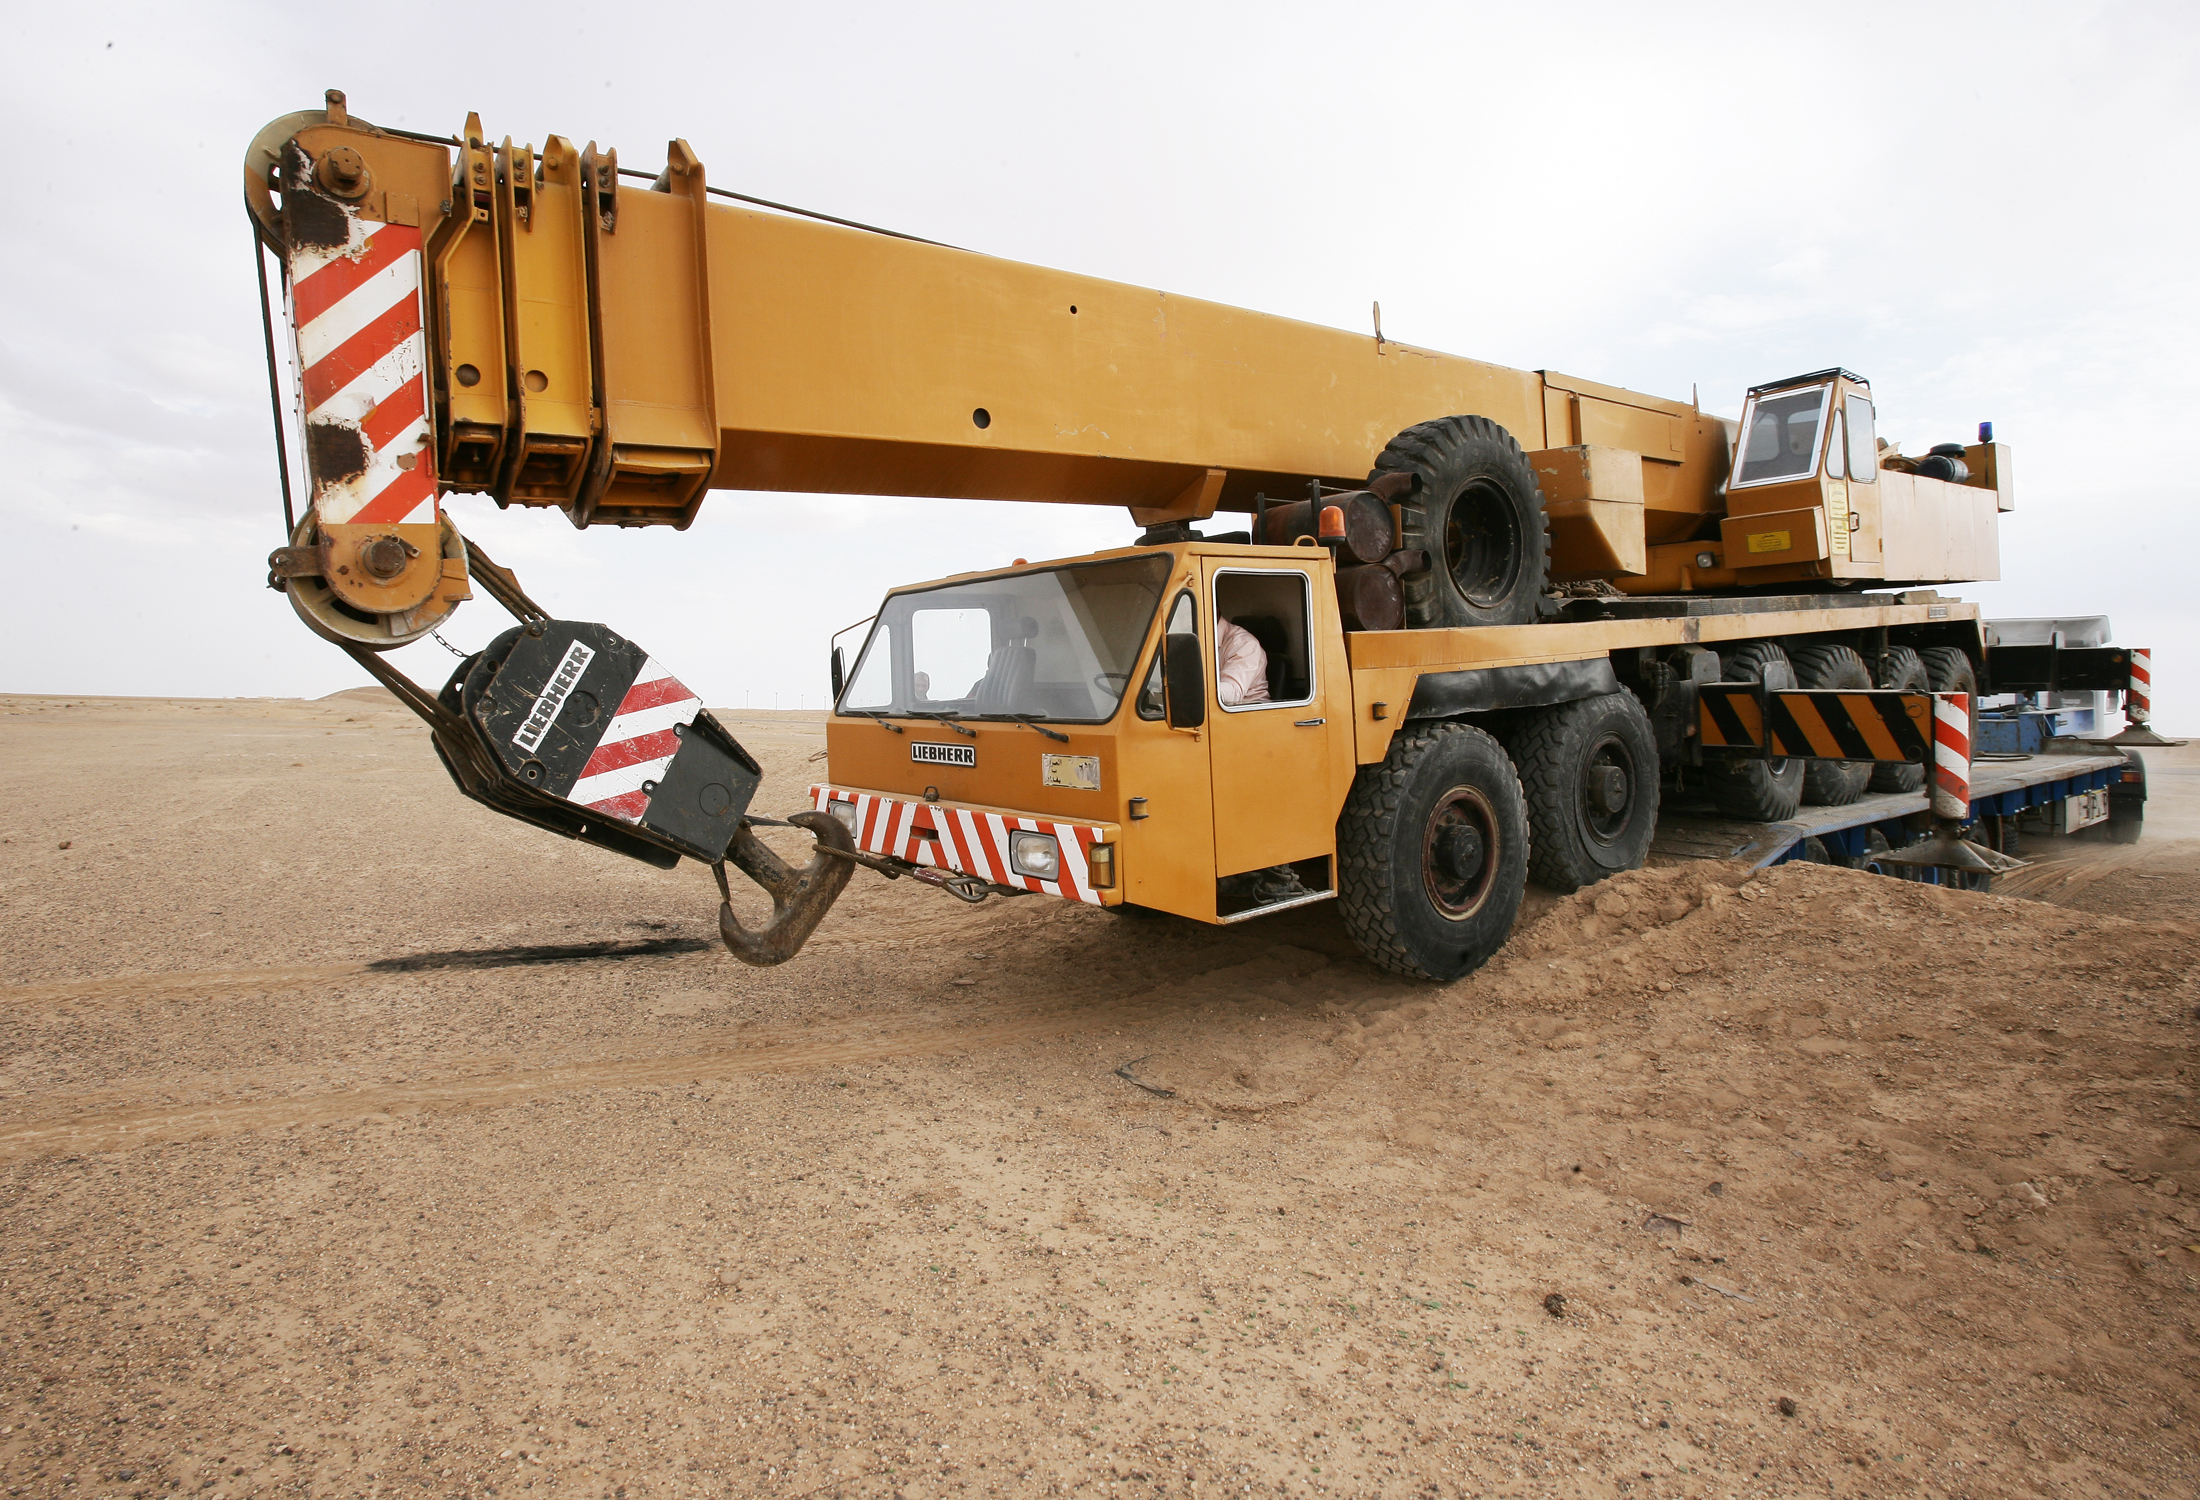 Truck Crane: Truck Crane Dimensions